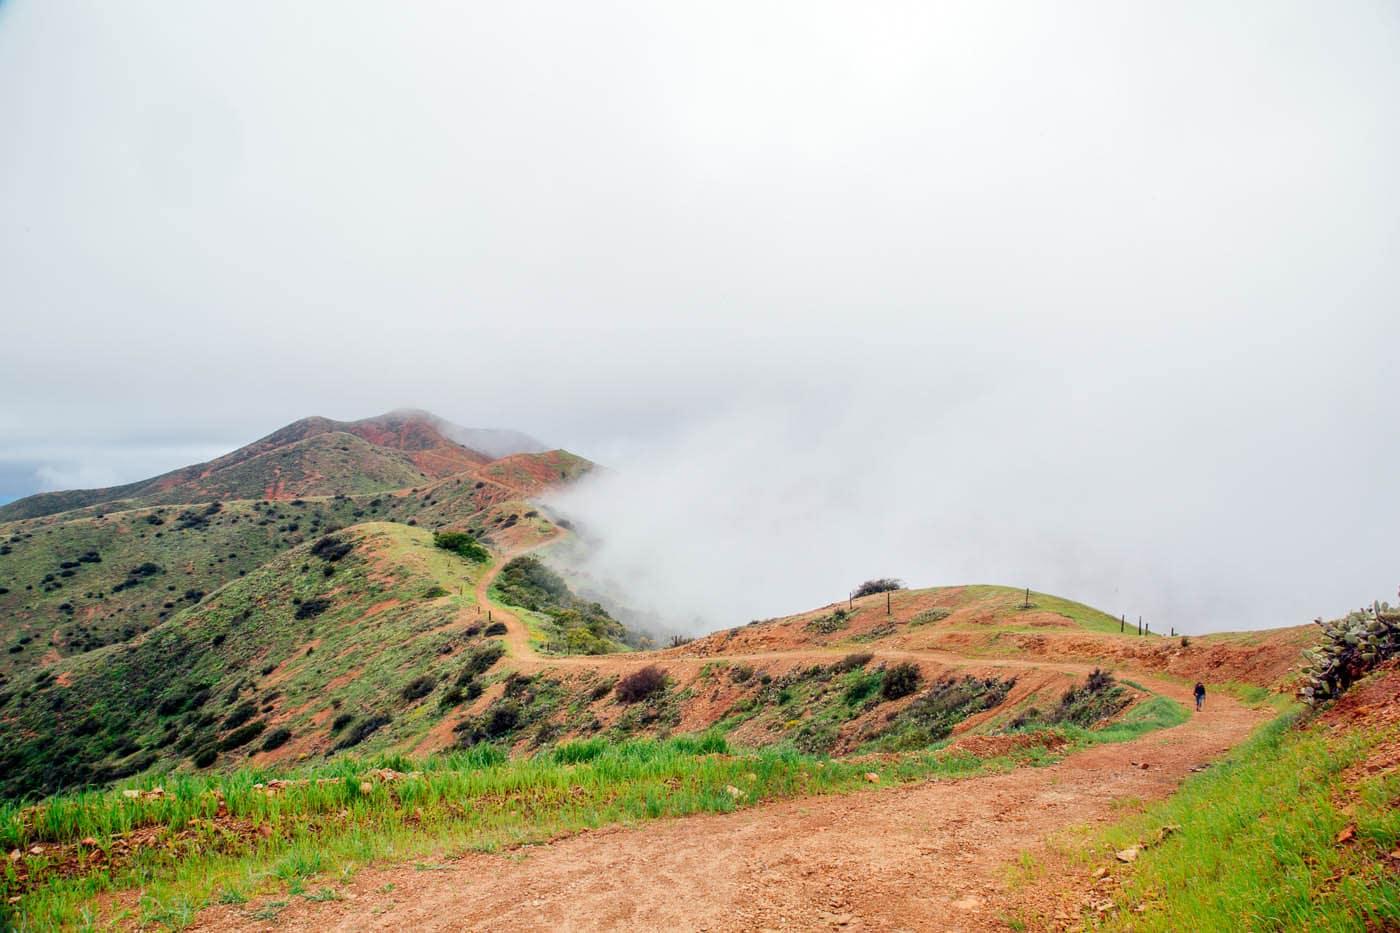 Ridgeline on the Trans Catalina Trail